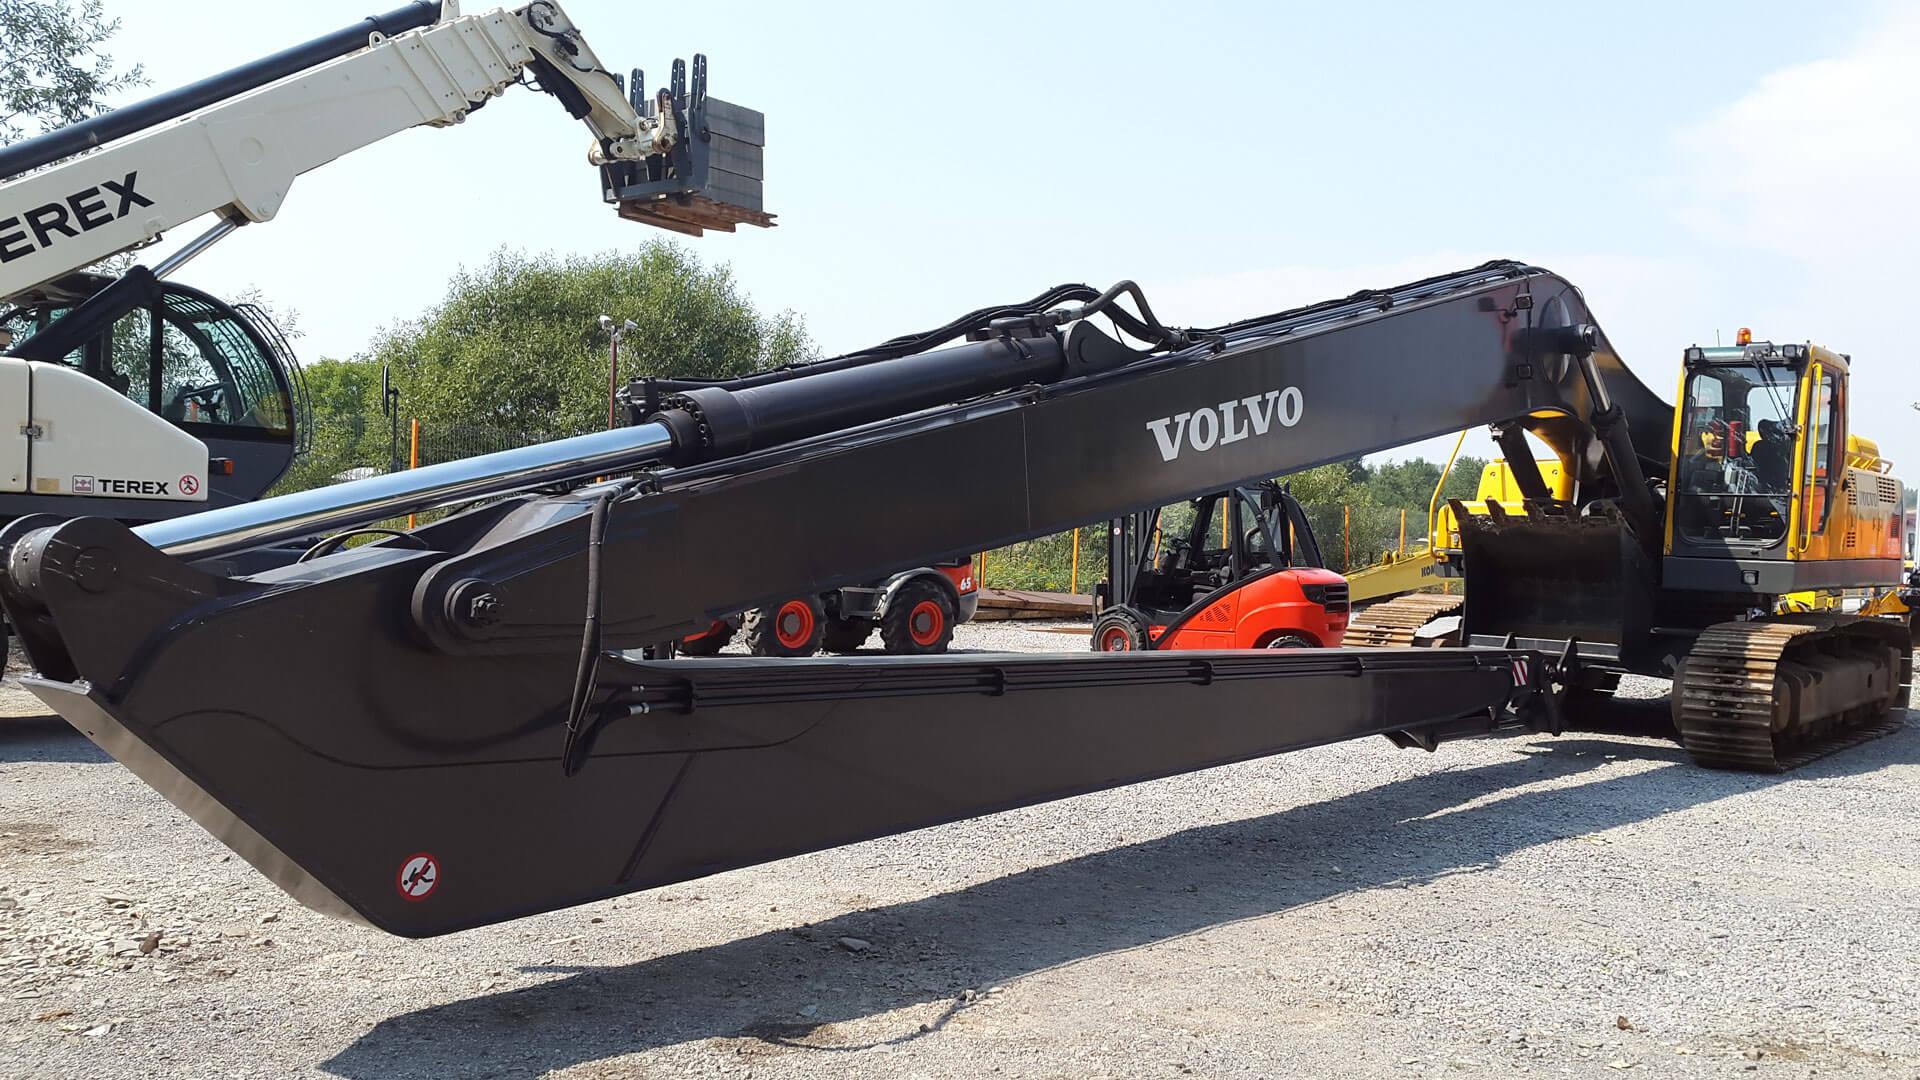 volvo-EC460Blc-long-reach-2